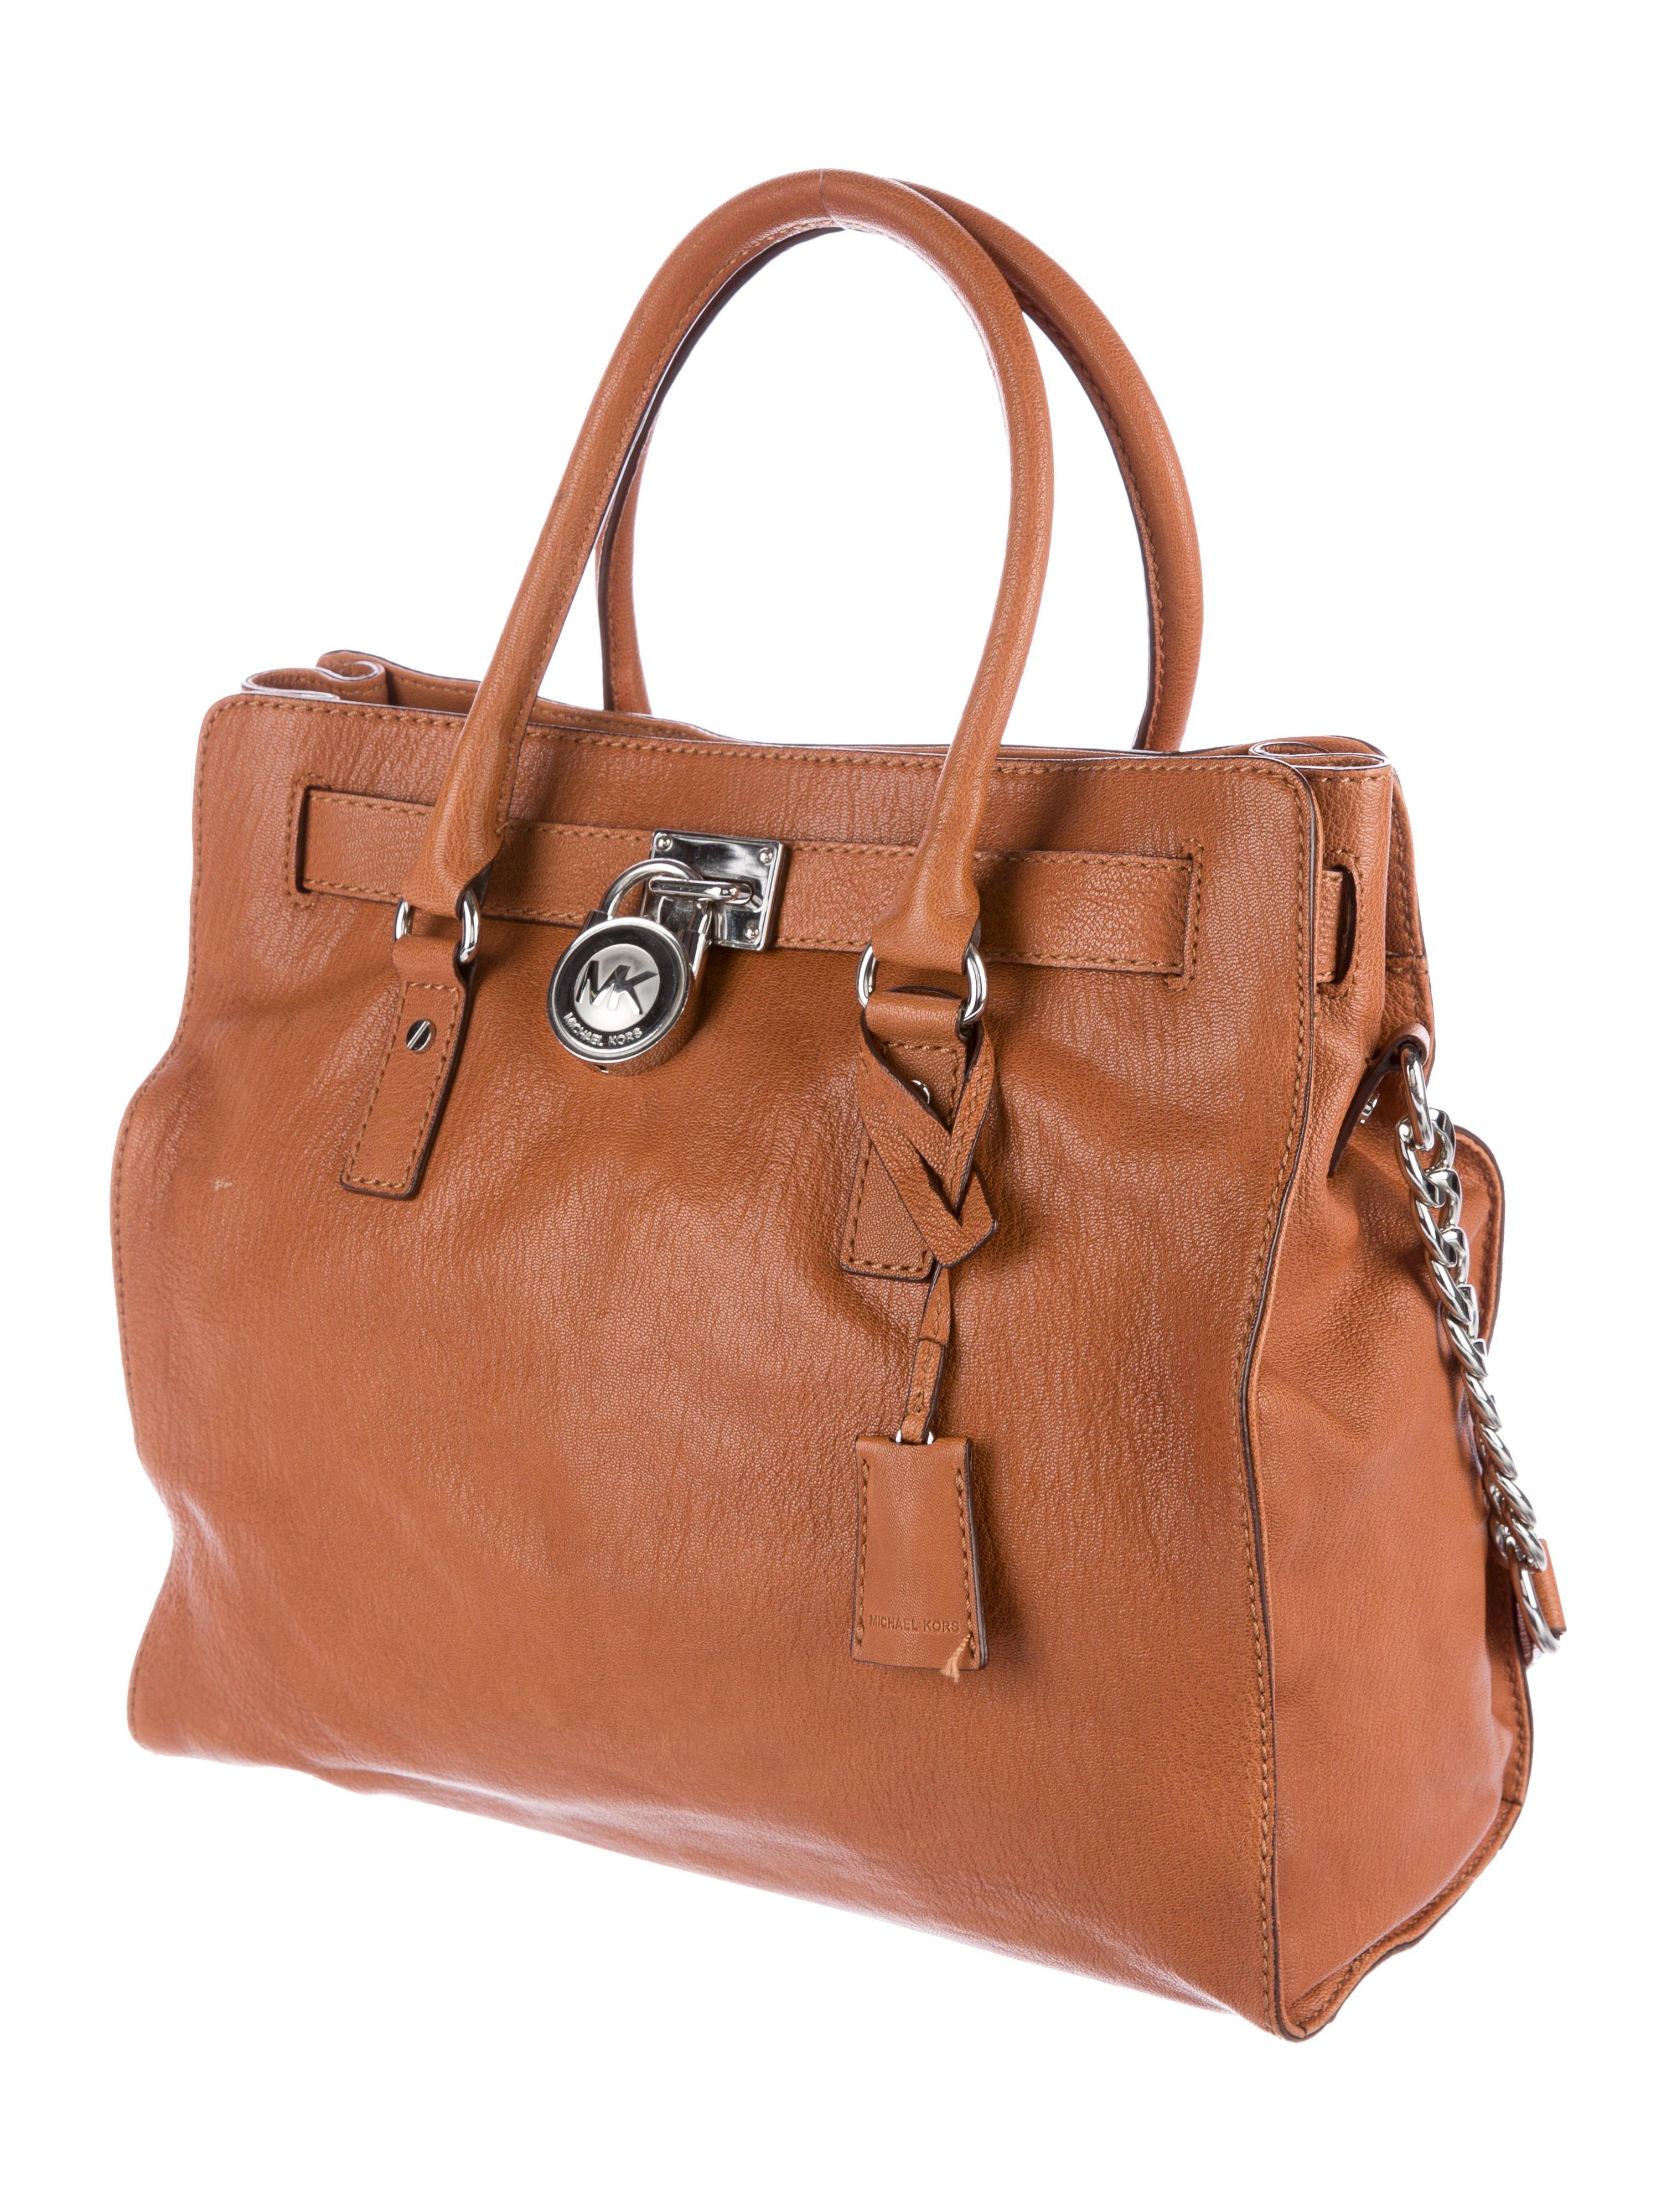 michael michael kors hamilton leather satchel handbags. Black Bedroom Furniture Sets. Home Design Ideas